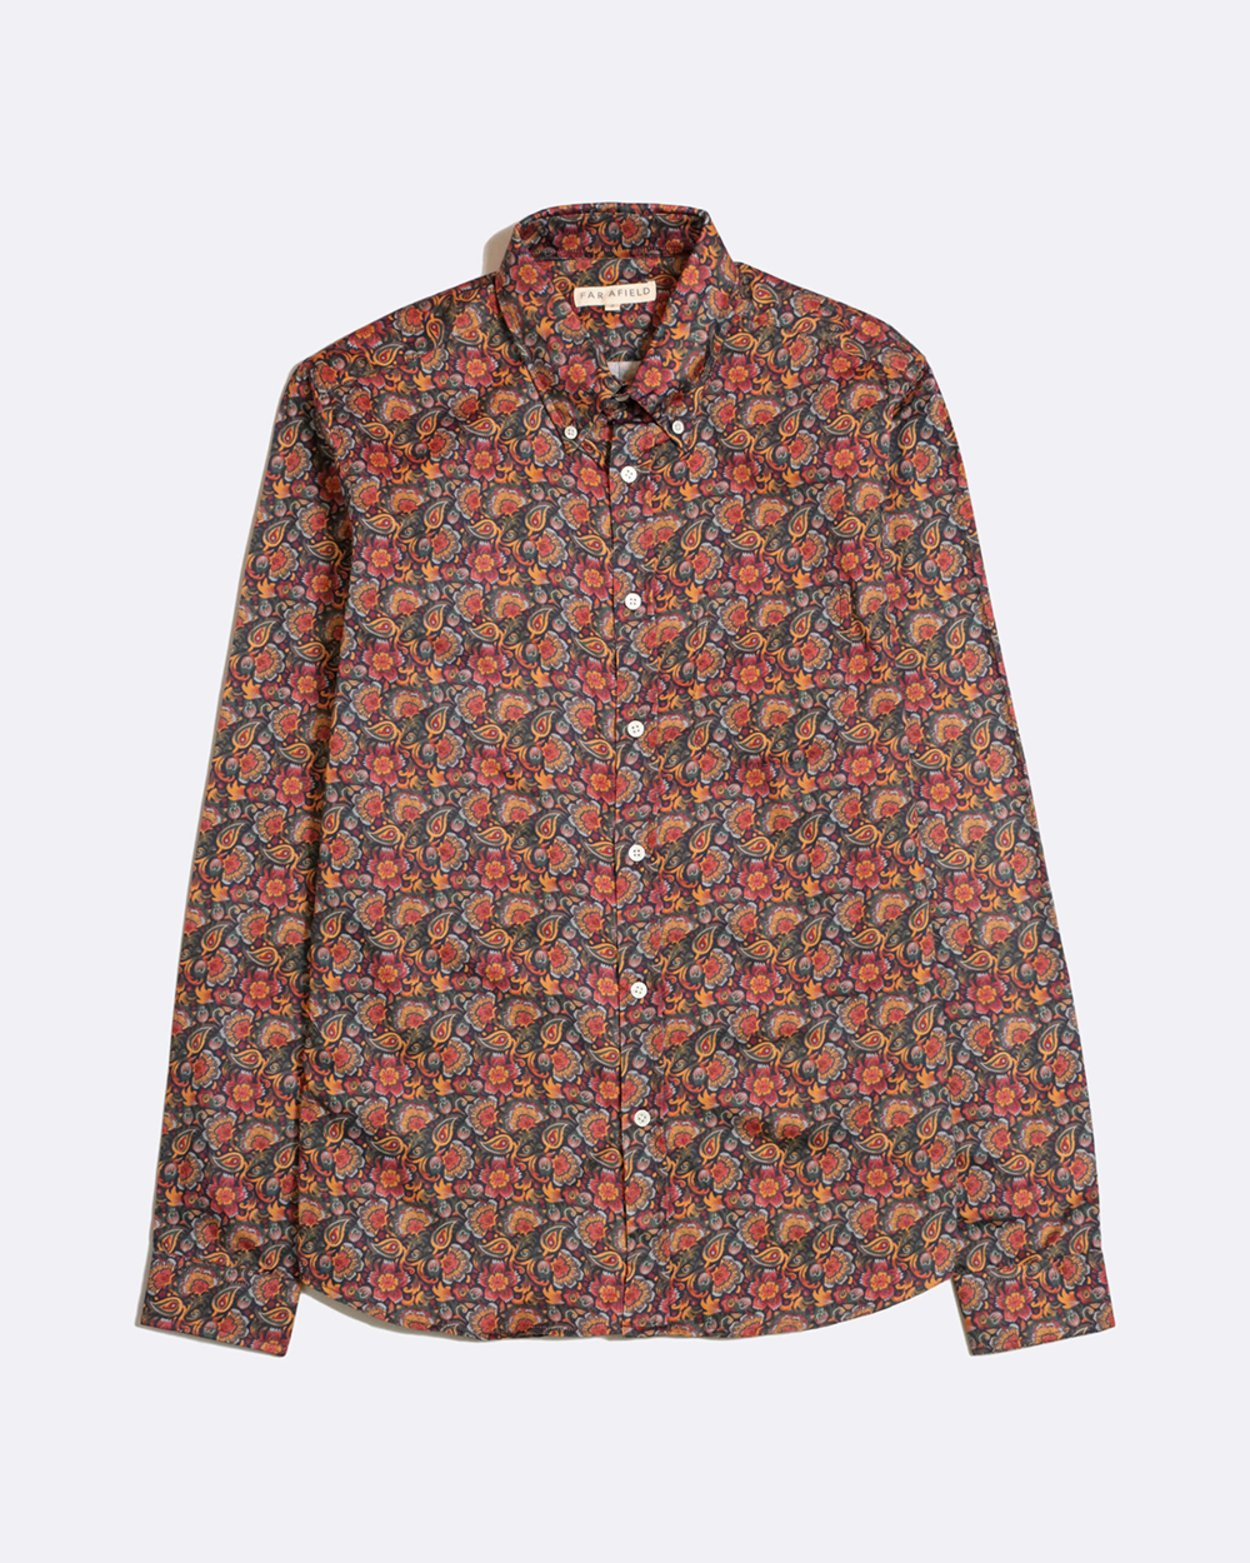 Floral Mod Button Down Shirt